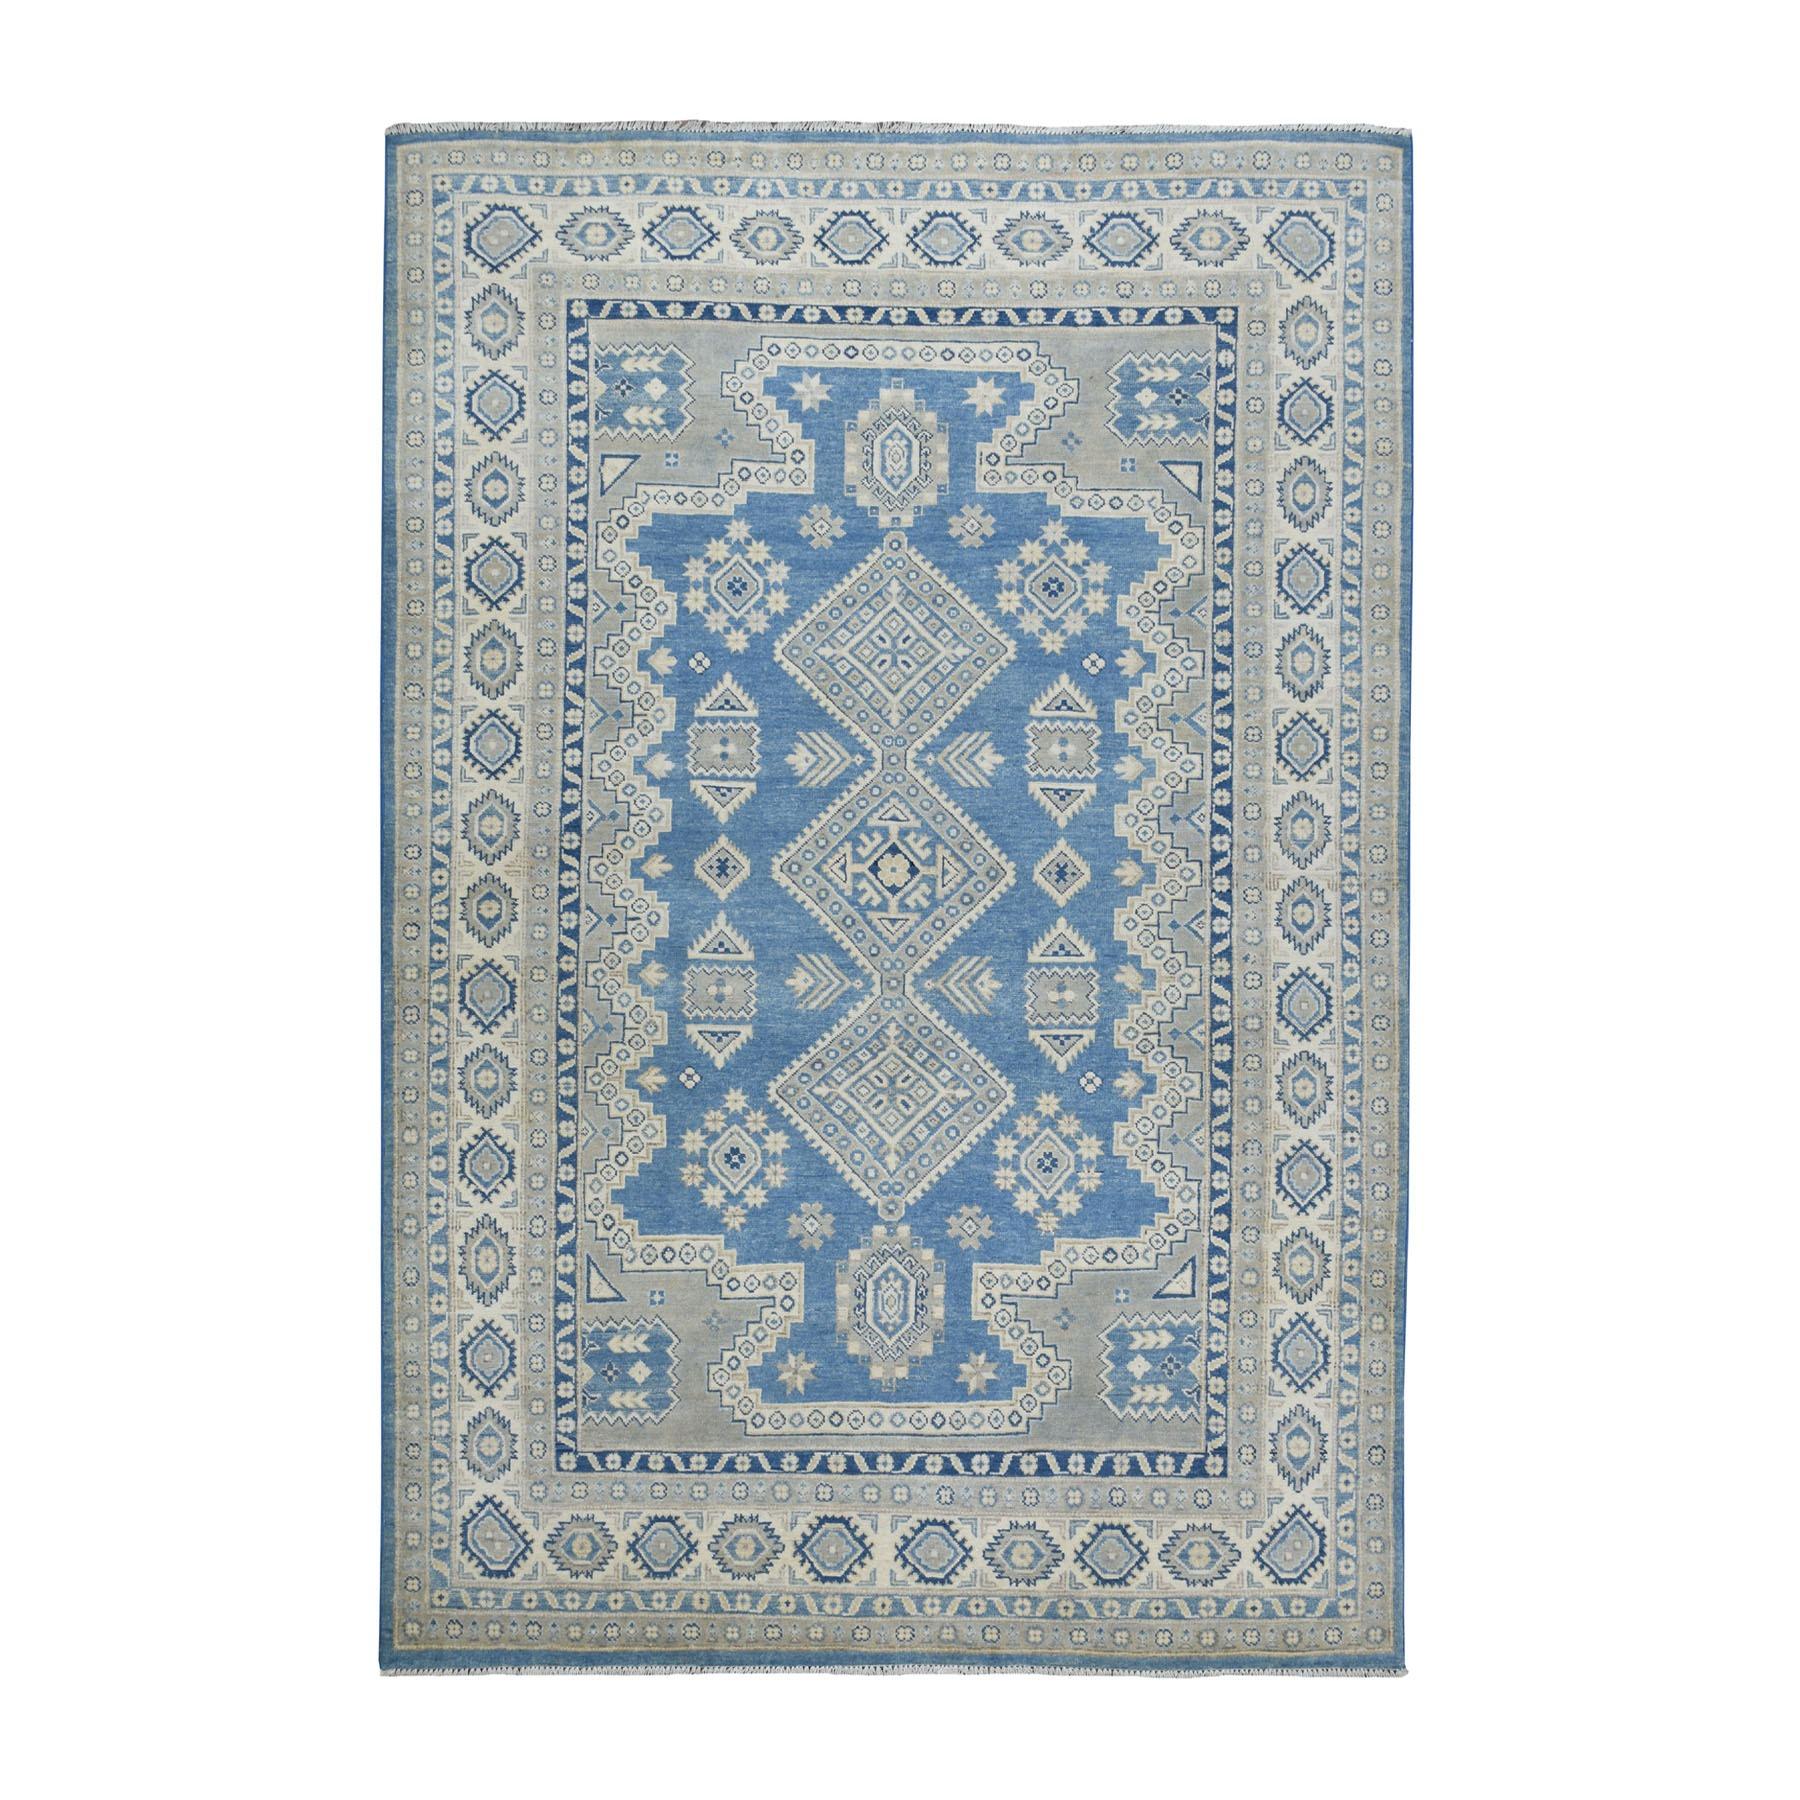 "6'x8'5"" Blue Vintage Look Kazak Geometric Design Pure Wool Hand Knotted Oriental Rug"